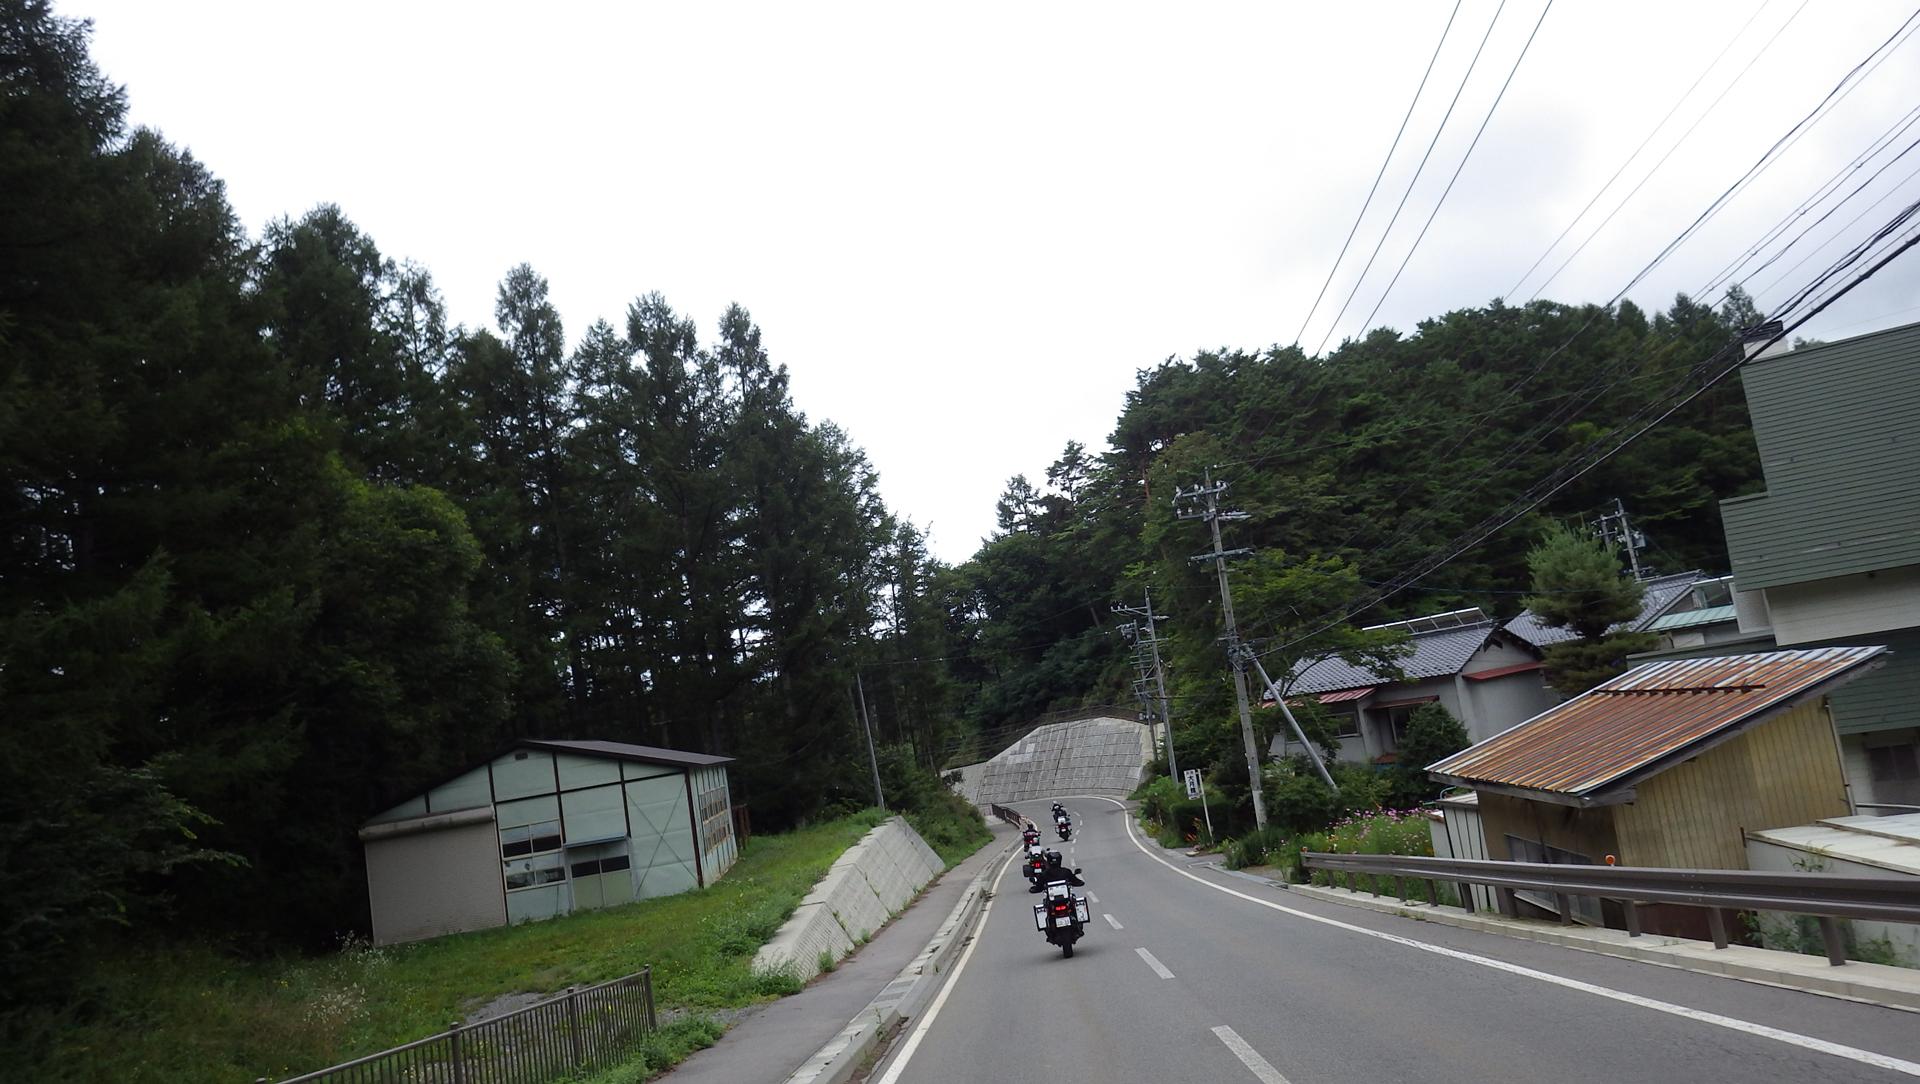 RIMG3498.jpg